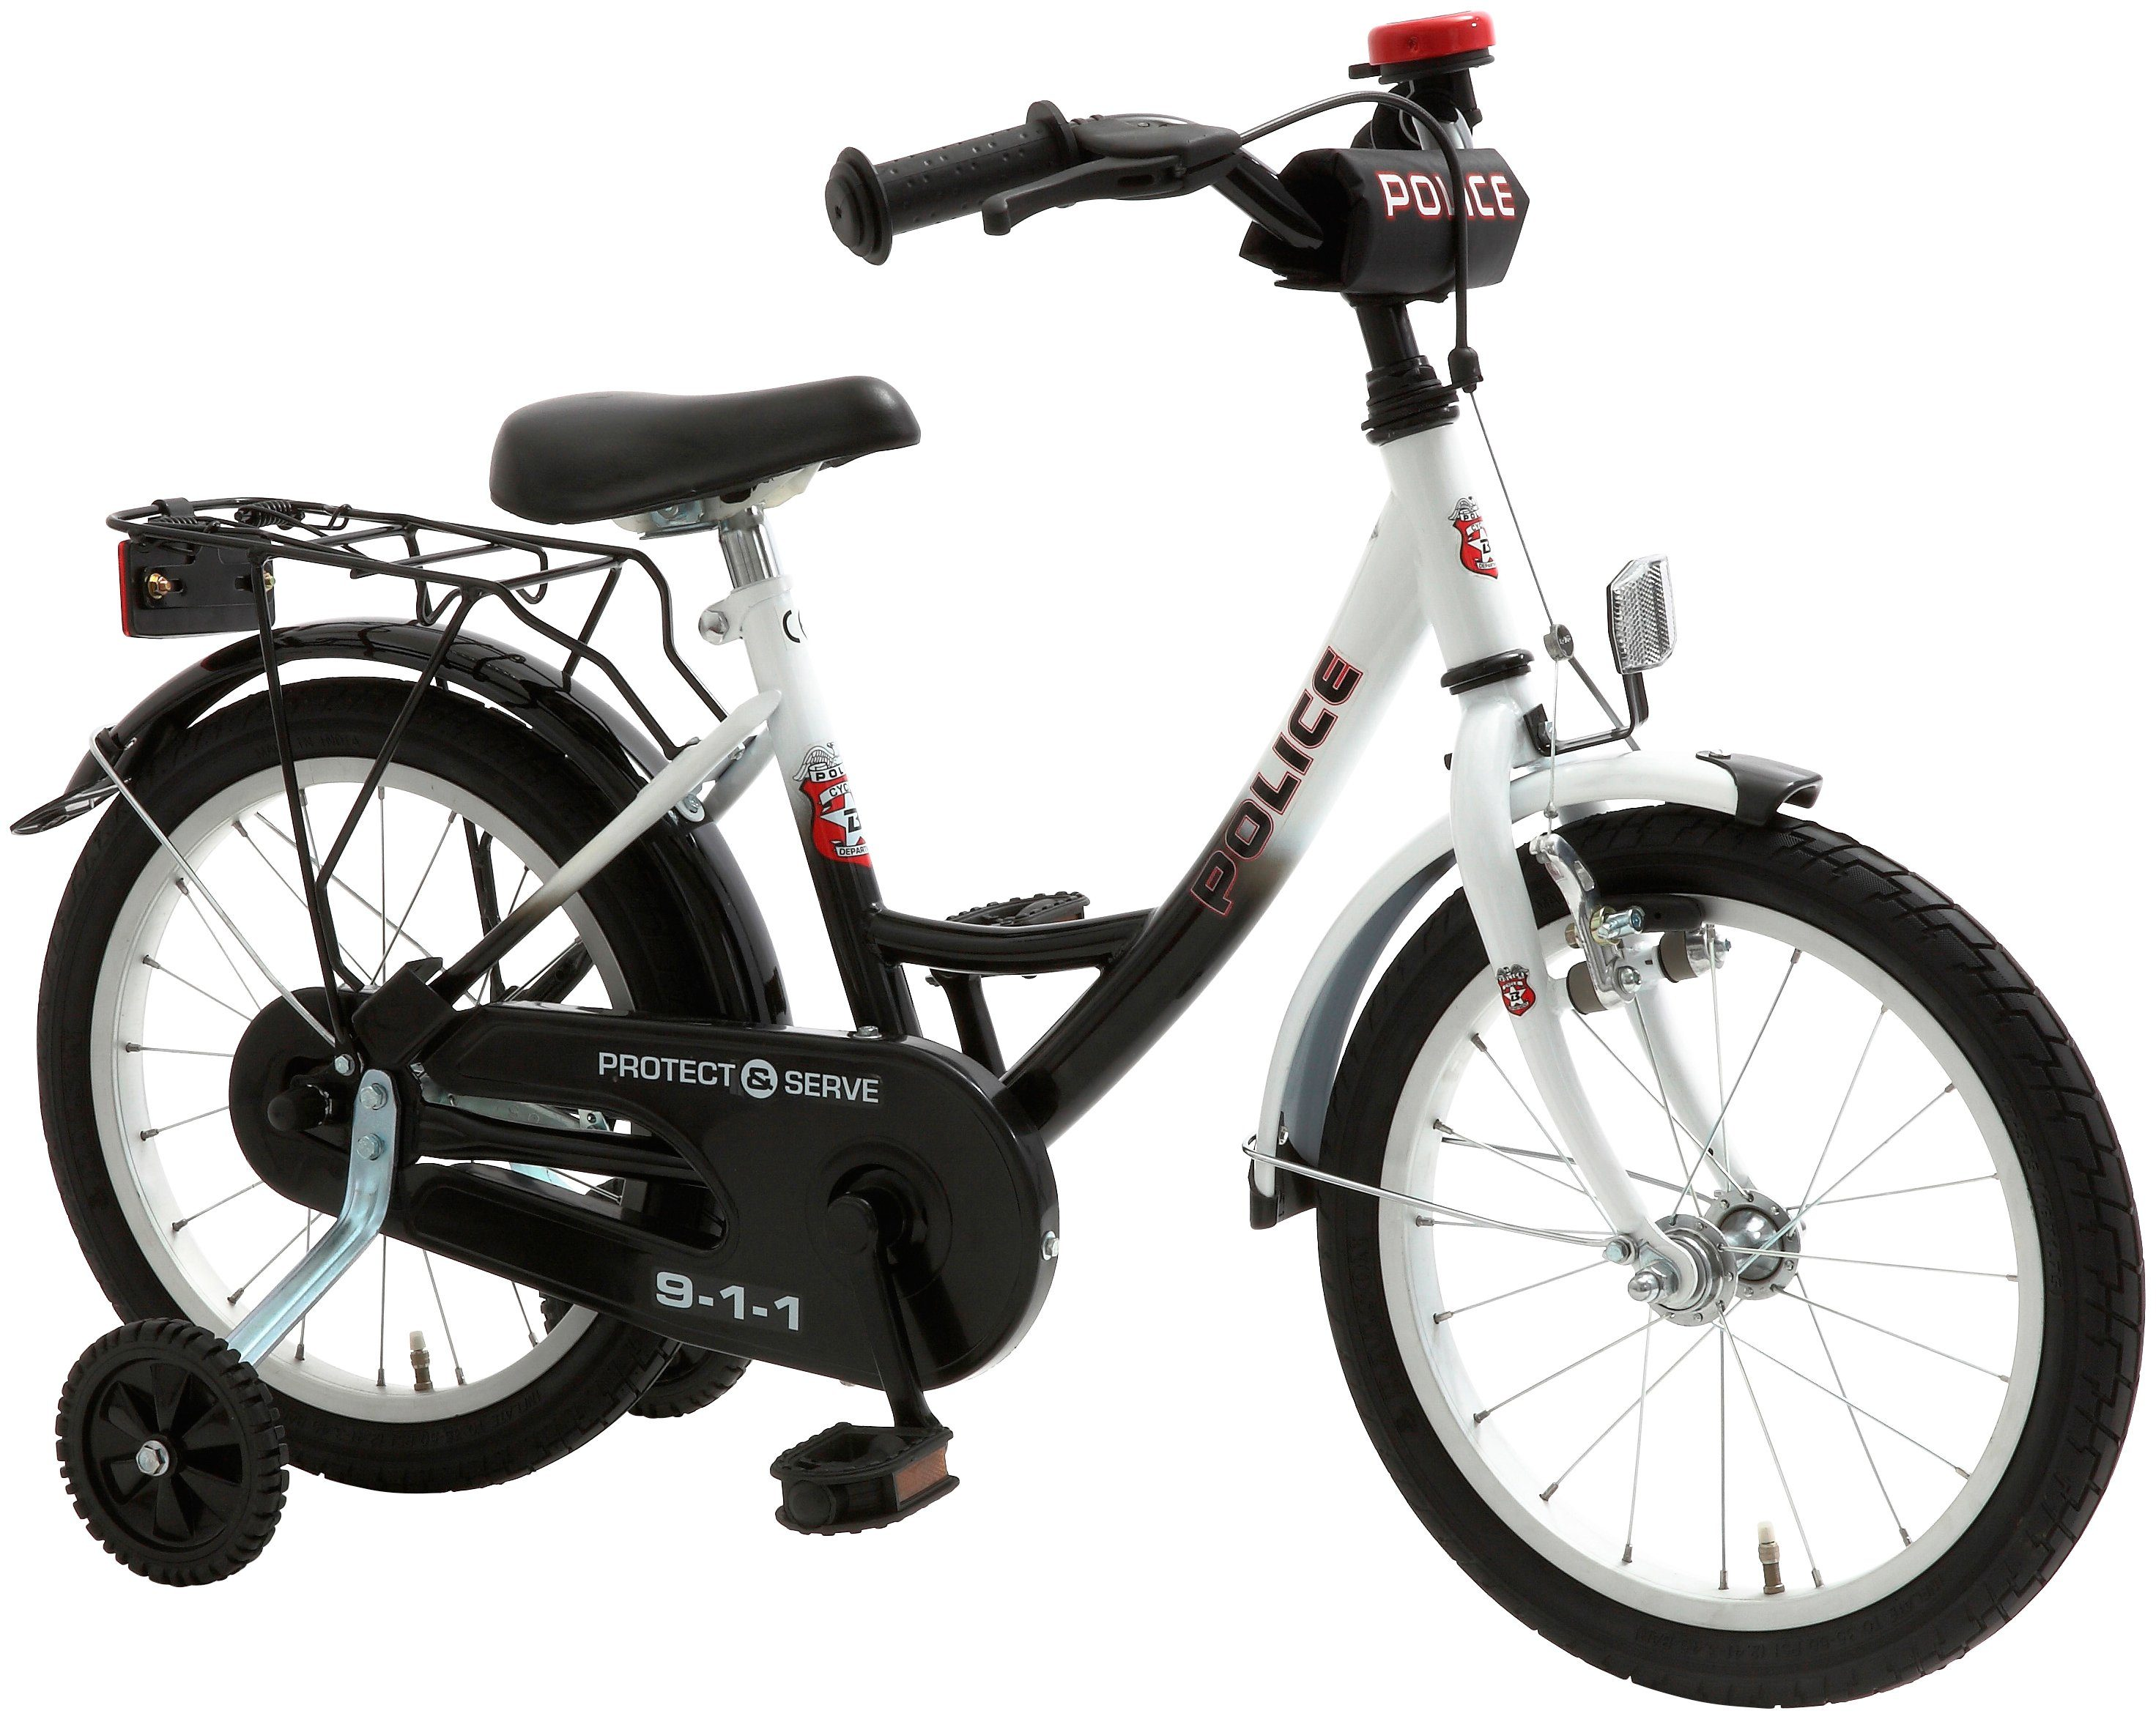 Cycles4Kids Kinderfahrrad »Police, 45,72 cm (18 Zoll)«